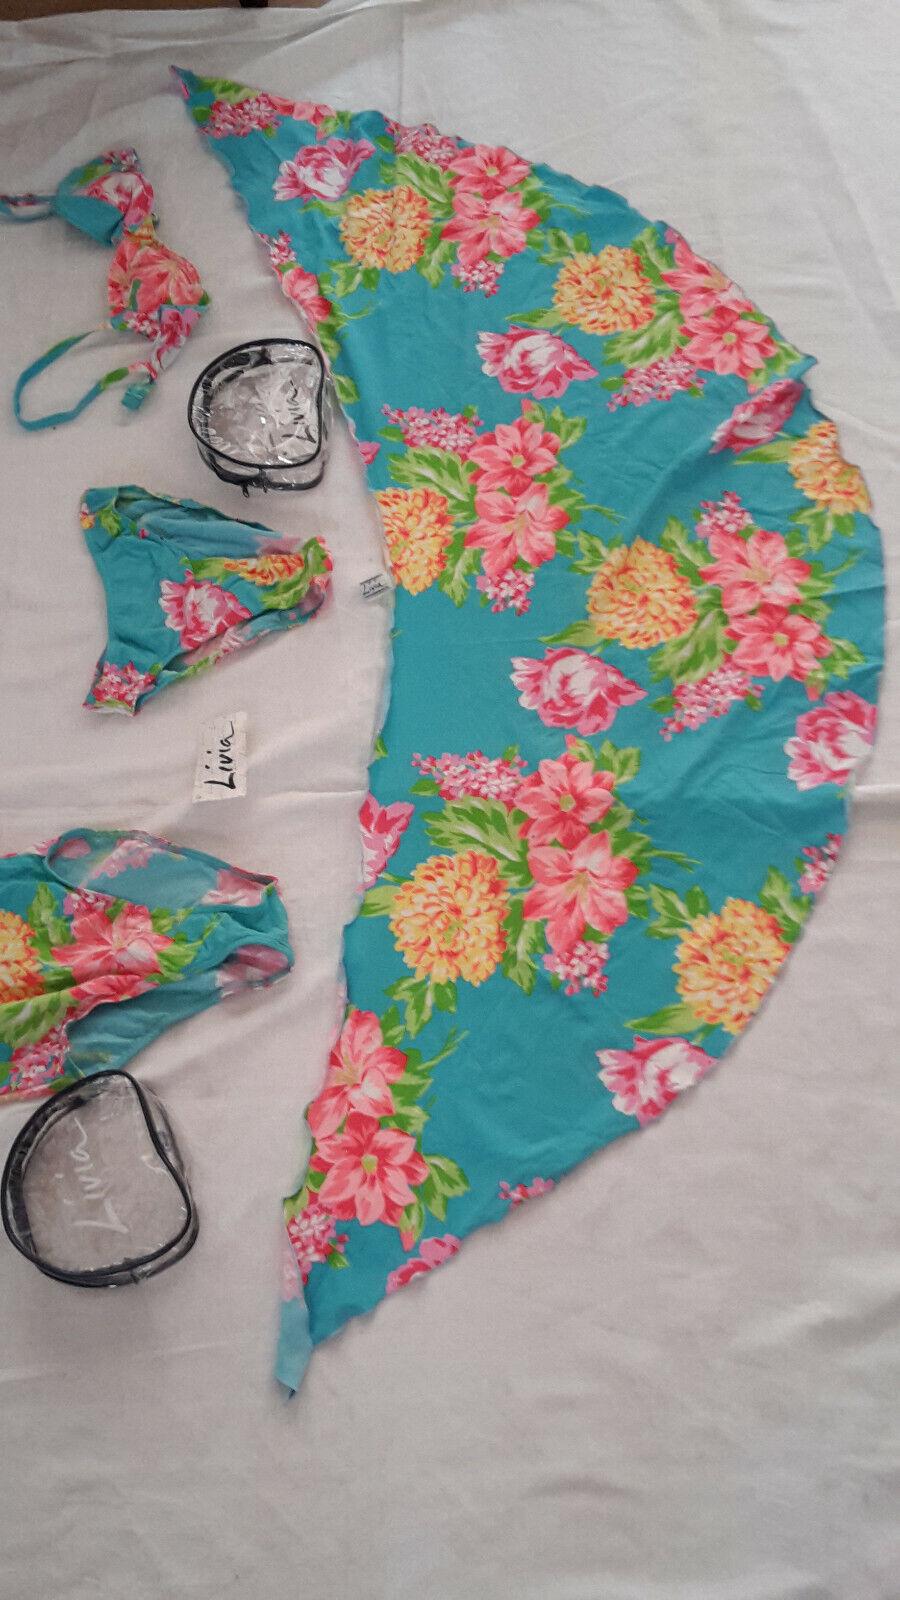 Badeset (Bikini, Badeanzug, Hüfttuch), Größe 36 Cup a,